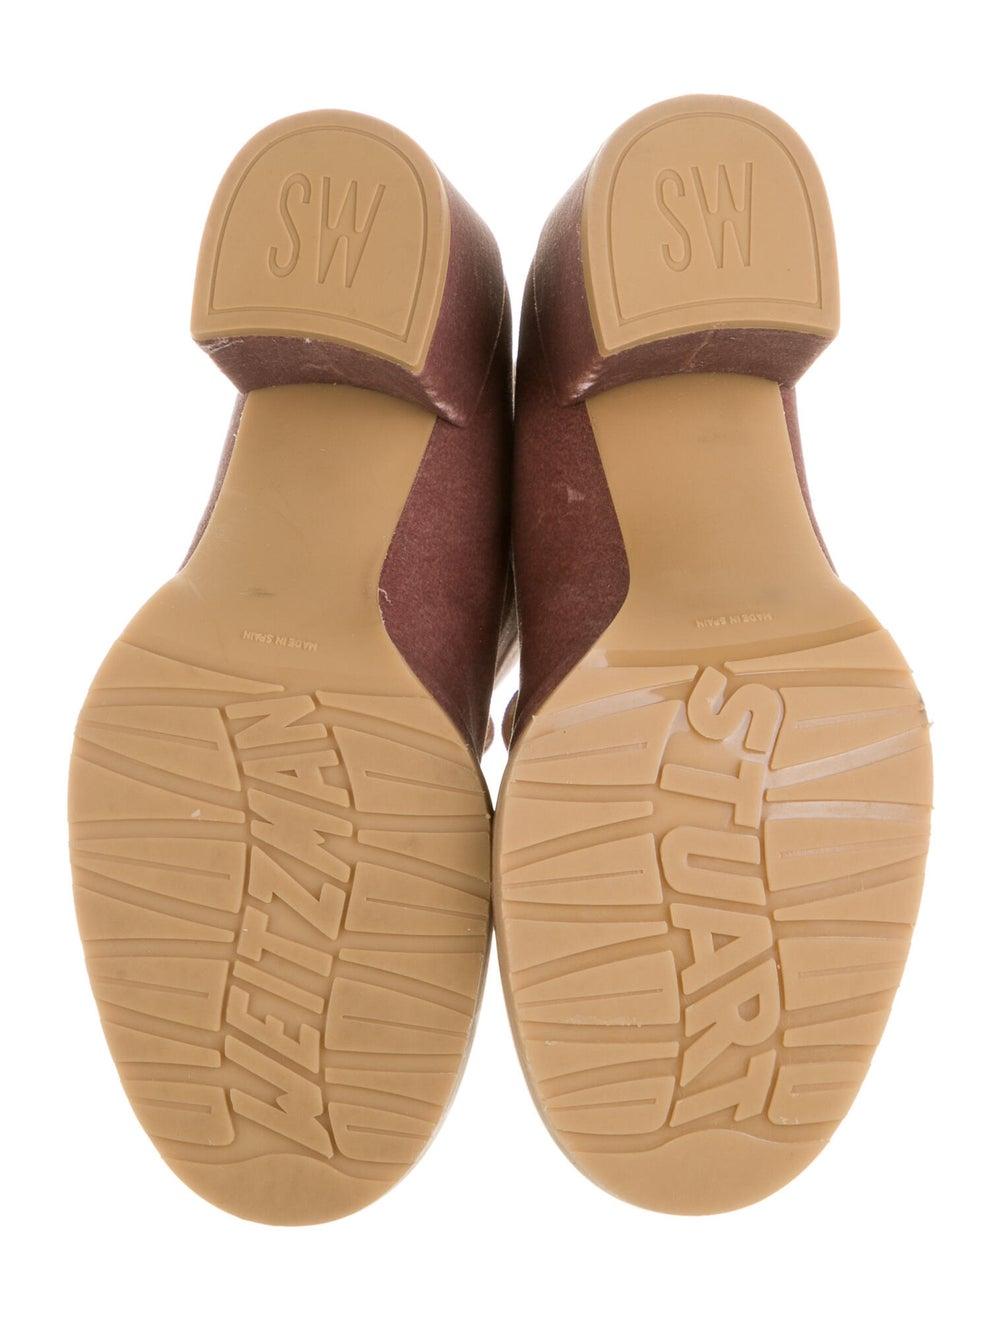 Stuart Weitzman Lace-Up Boots Pink - image 5